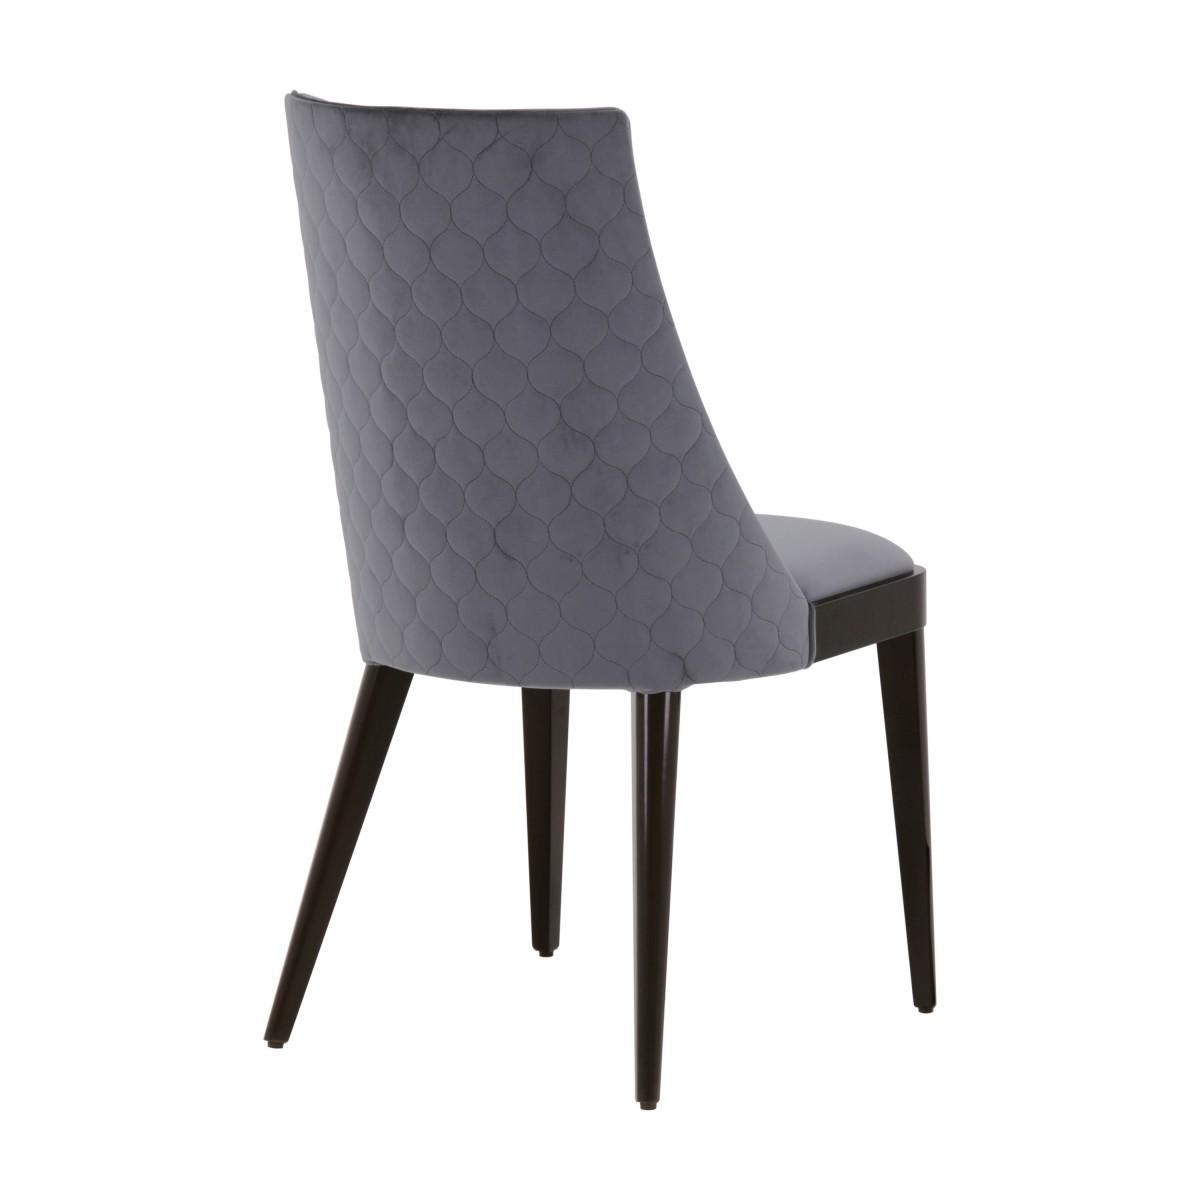 italian modern chair norvegia 3 9483